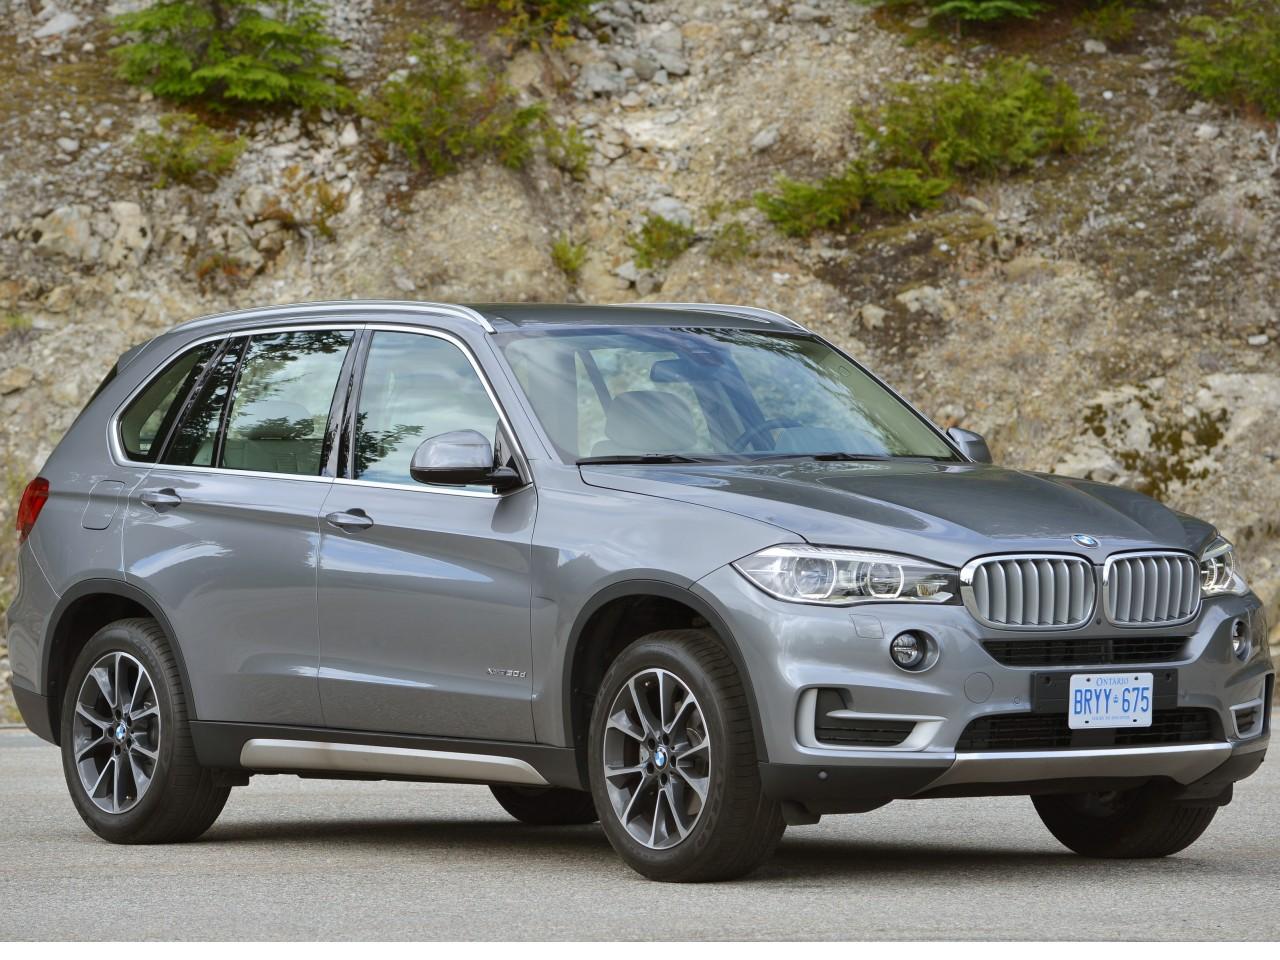 BMW X5 2013年モデル 新車画像